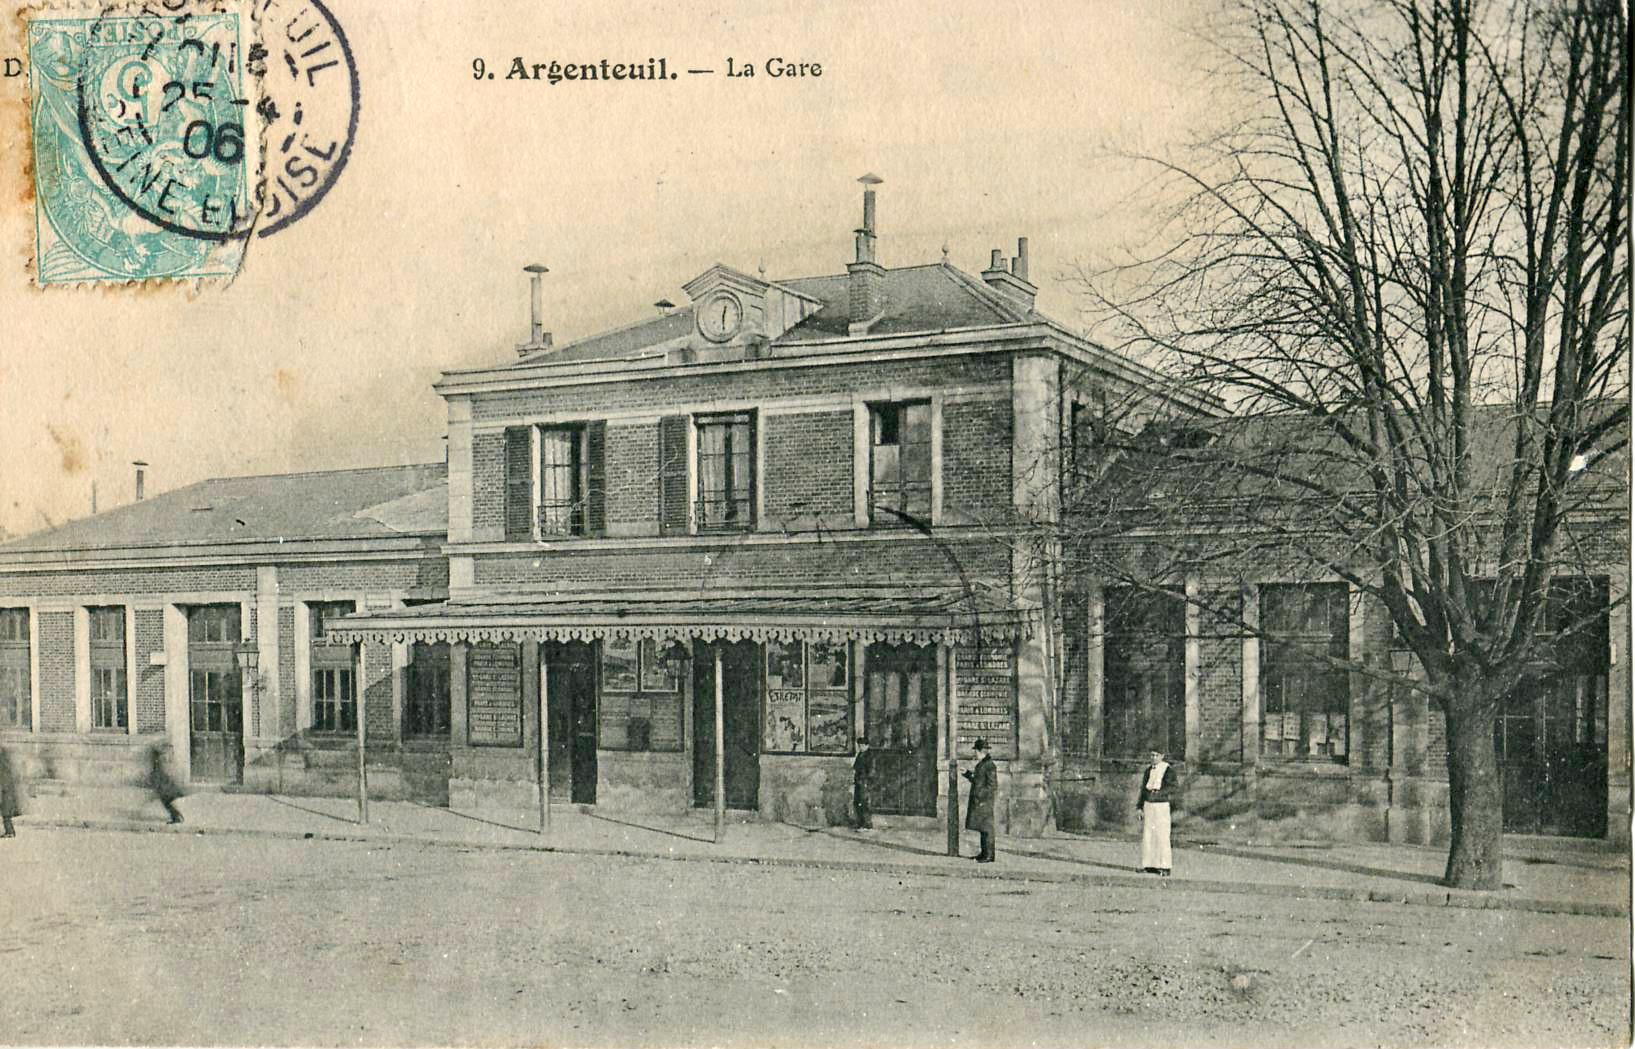 Argenteuil France  City pictures : INCONNU 9 ARGENTEUIL Argenteuil, France